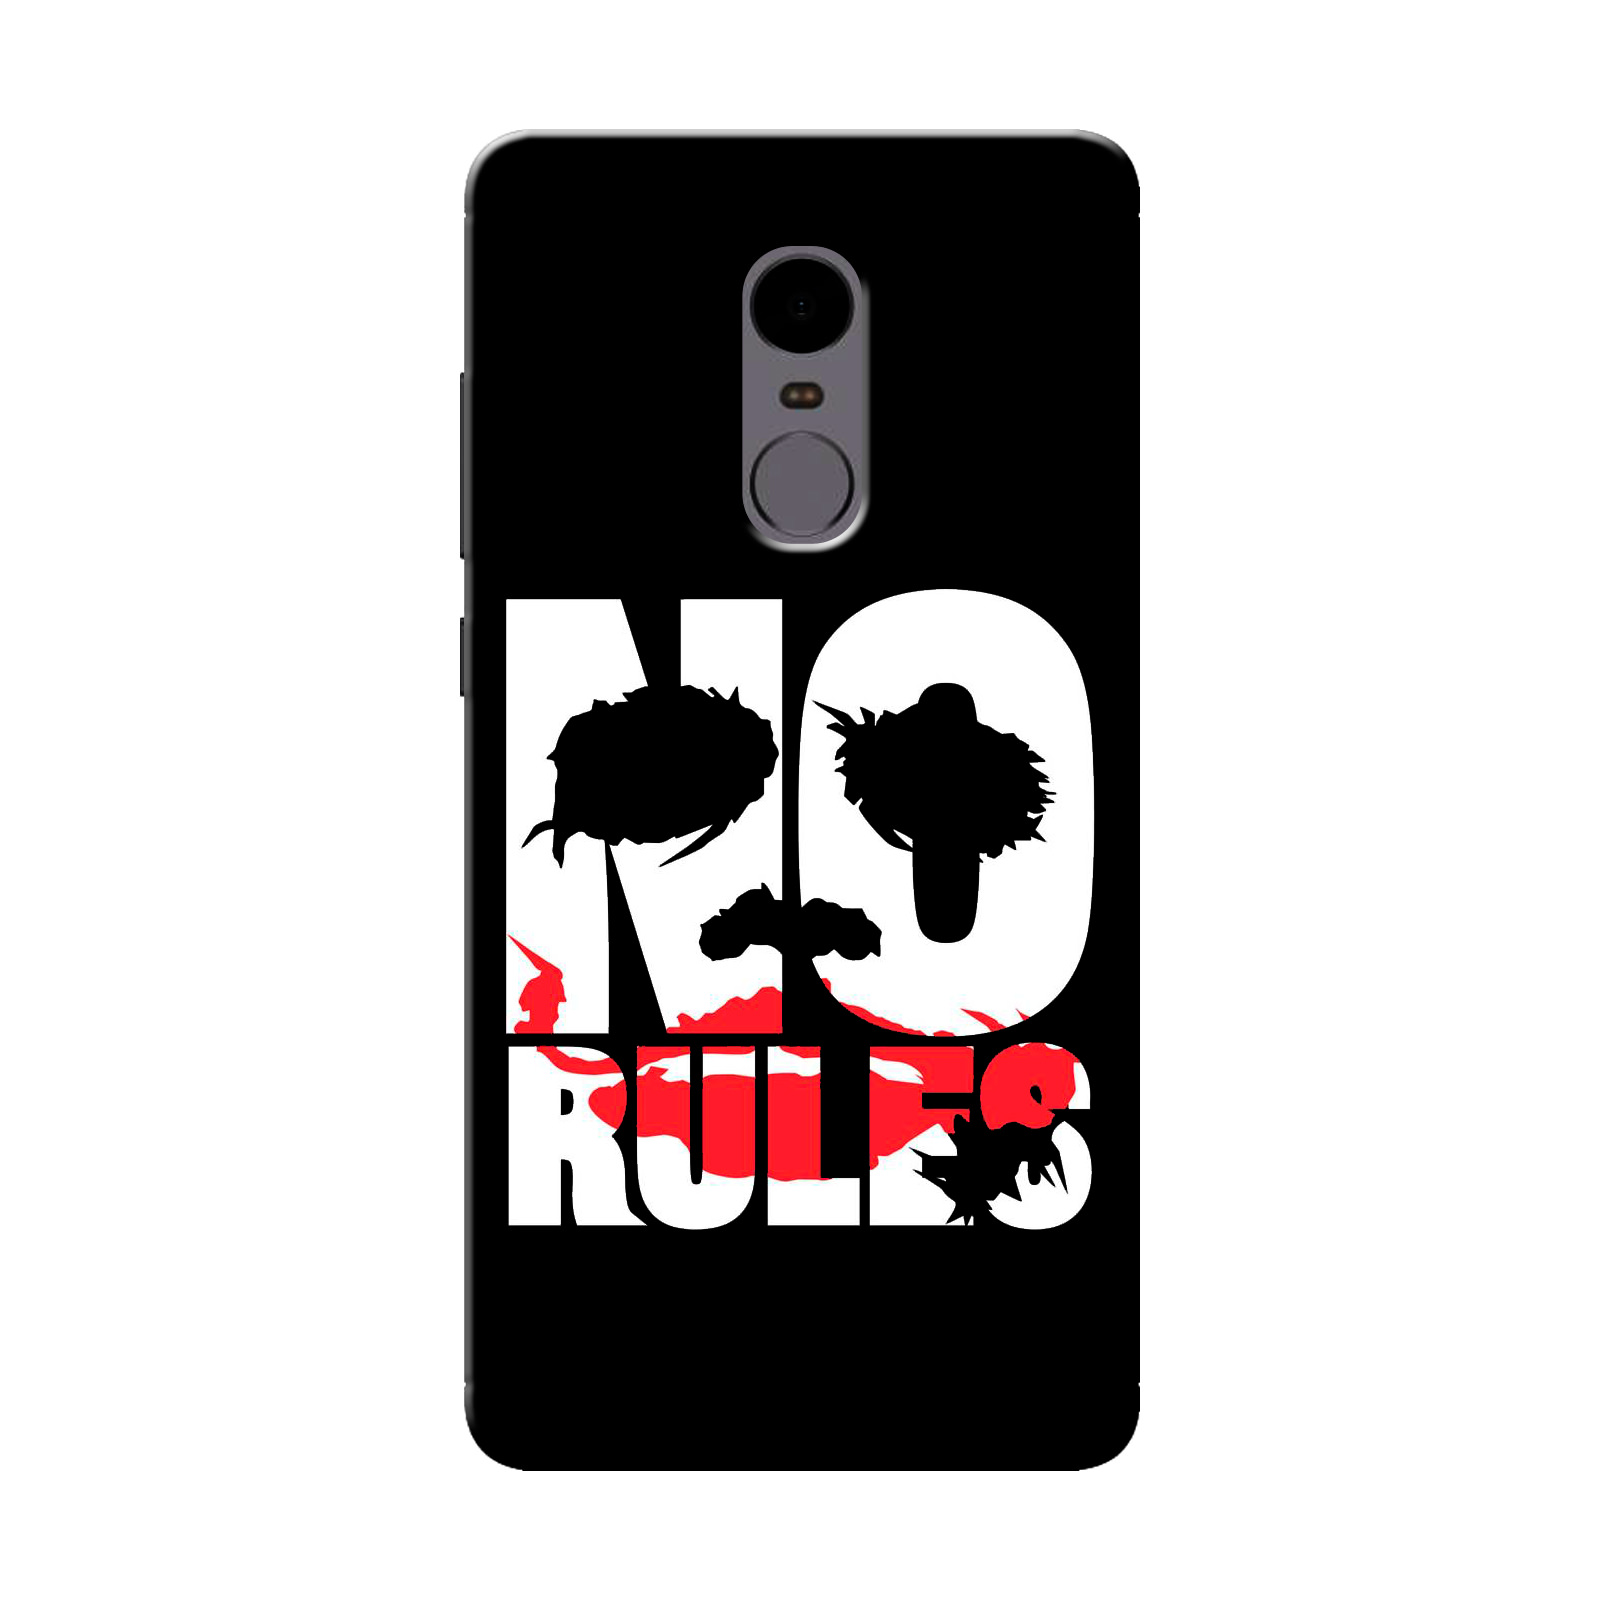 sairafashions Wild Thunder Mi Redmi Note 4 Mobile Back Cover Case And Designer Printed Hard Flexible Mobile Case Cover  - 1106